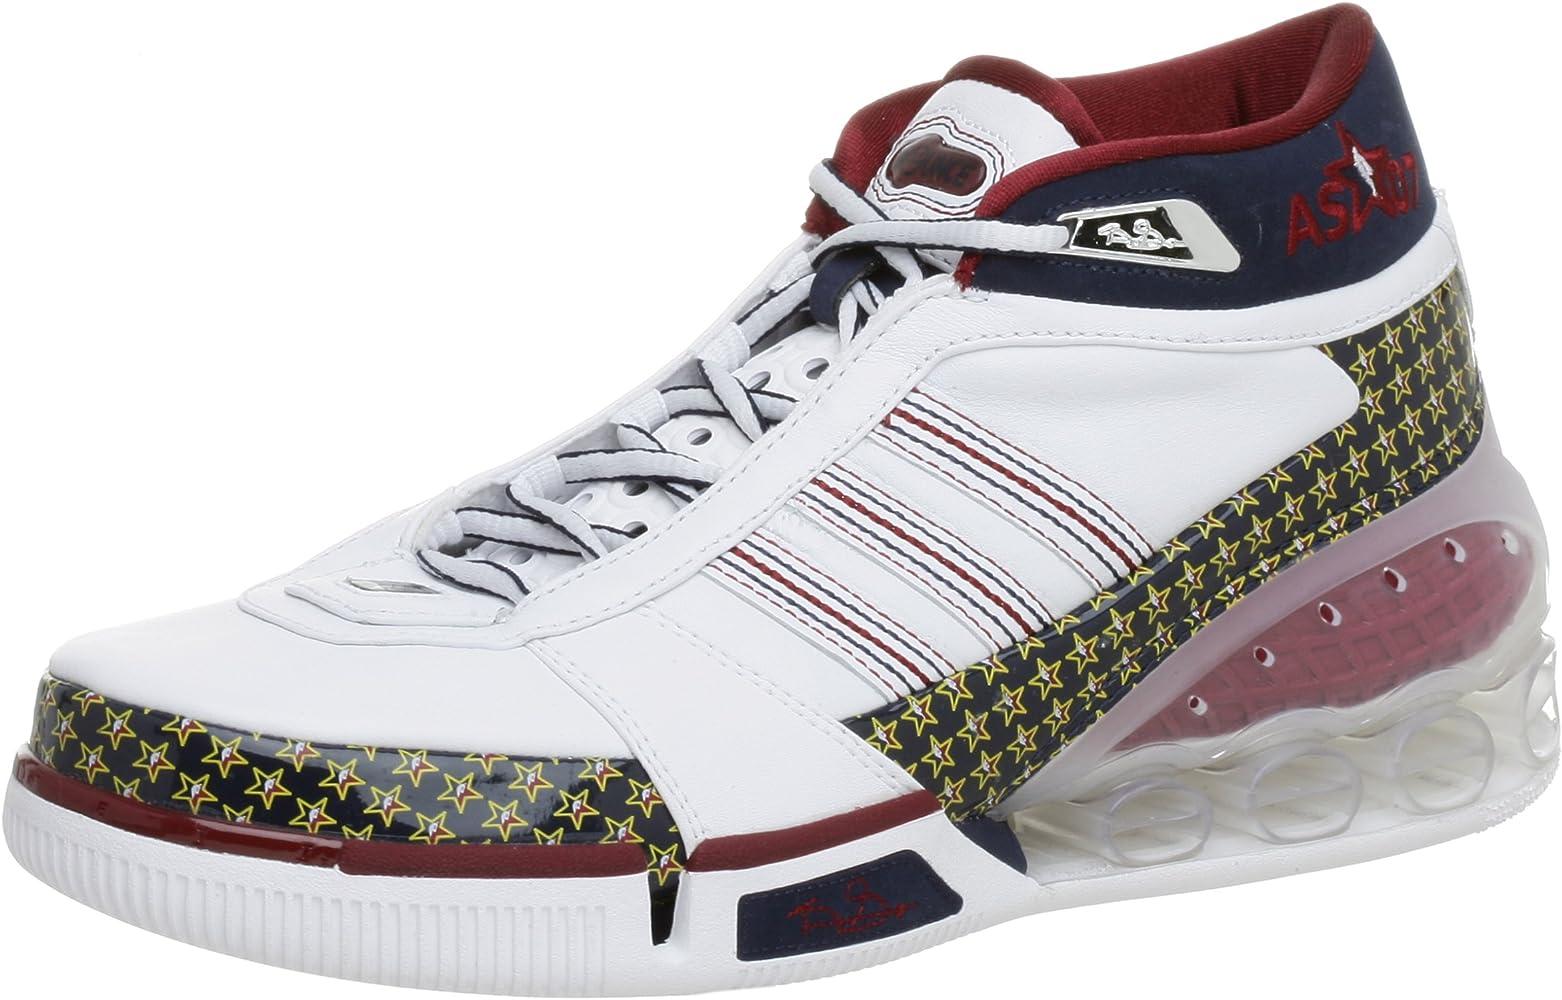 KG Bounce All-Star Basketball Shoe